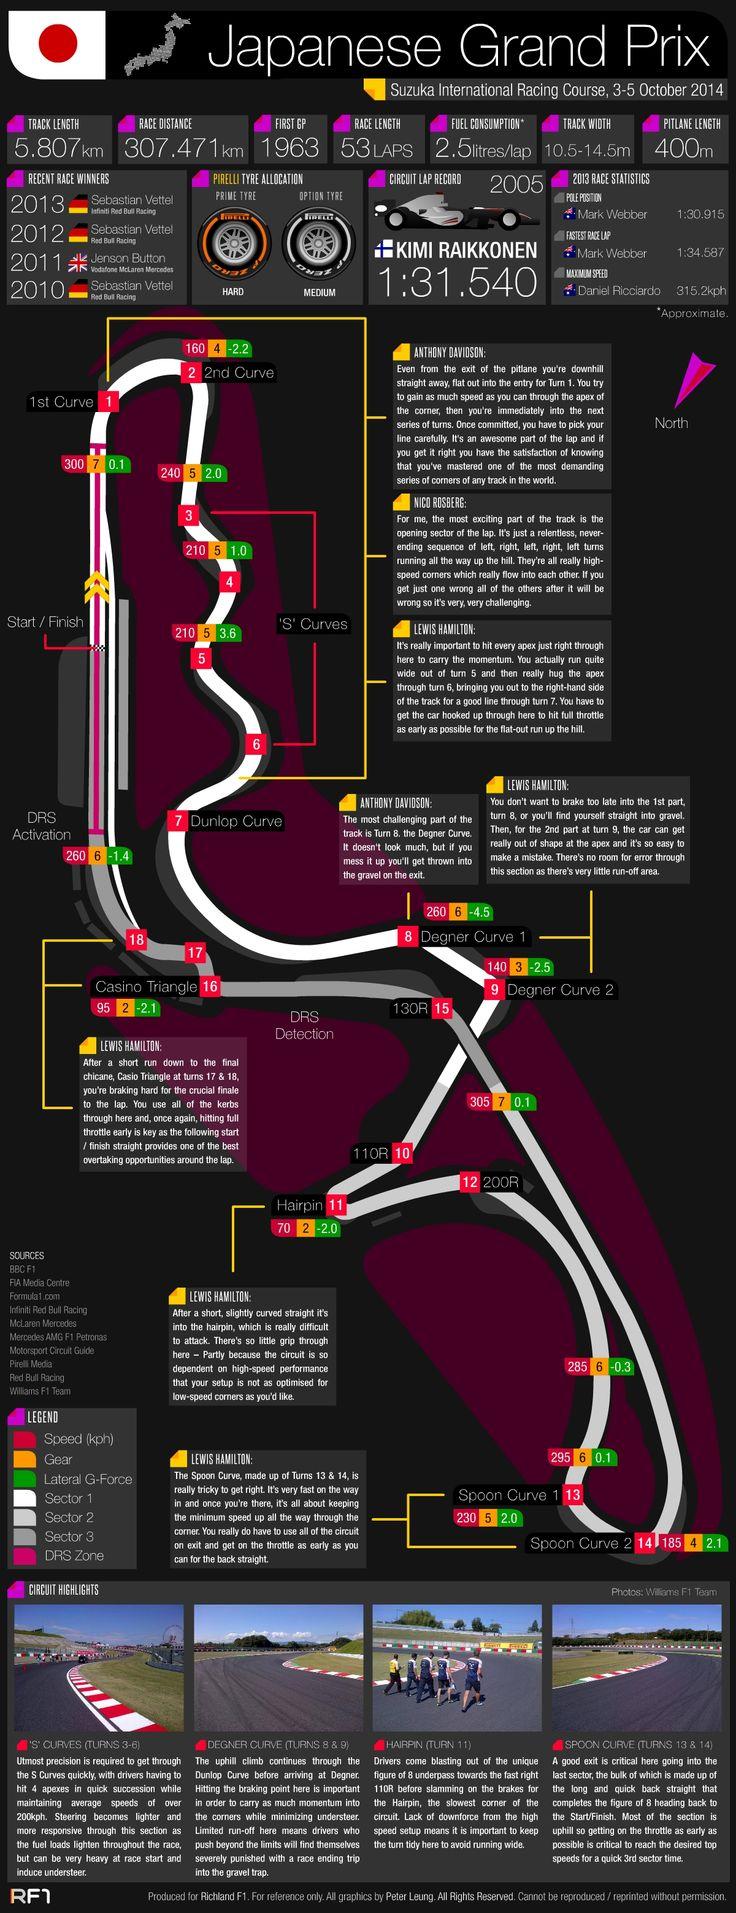 Grand Prix Guide - 2014 Japanese Grand Prix #Suzuka #F1